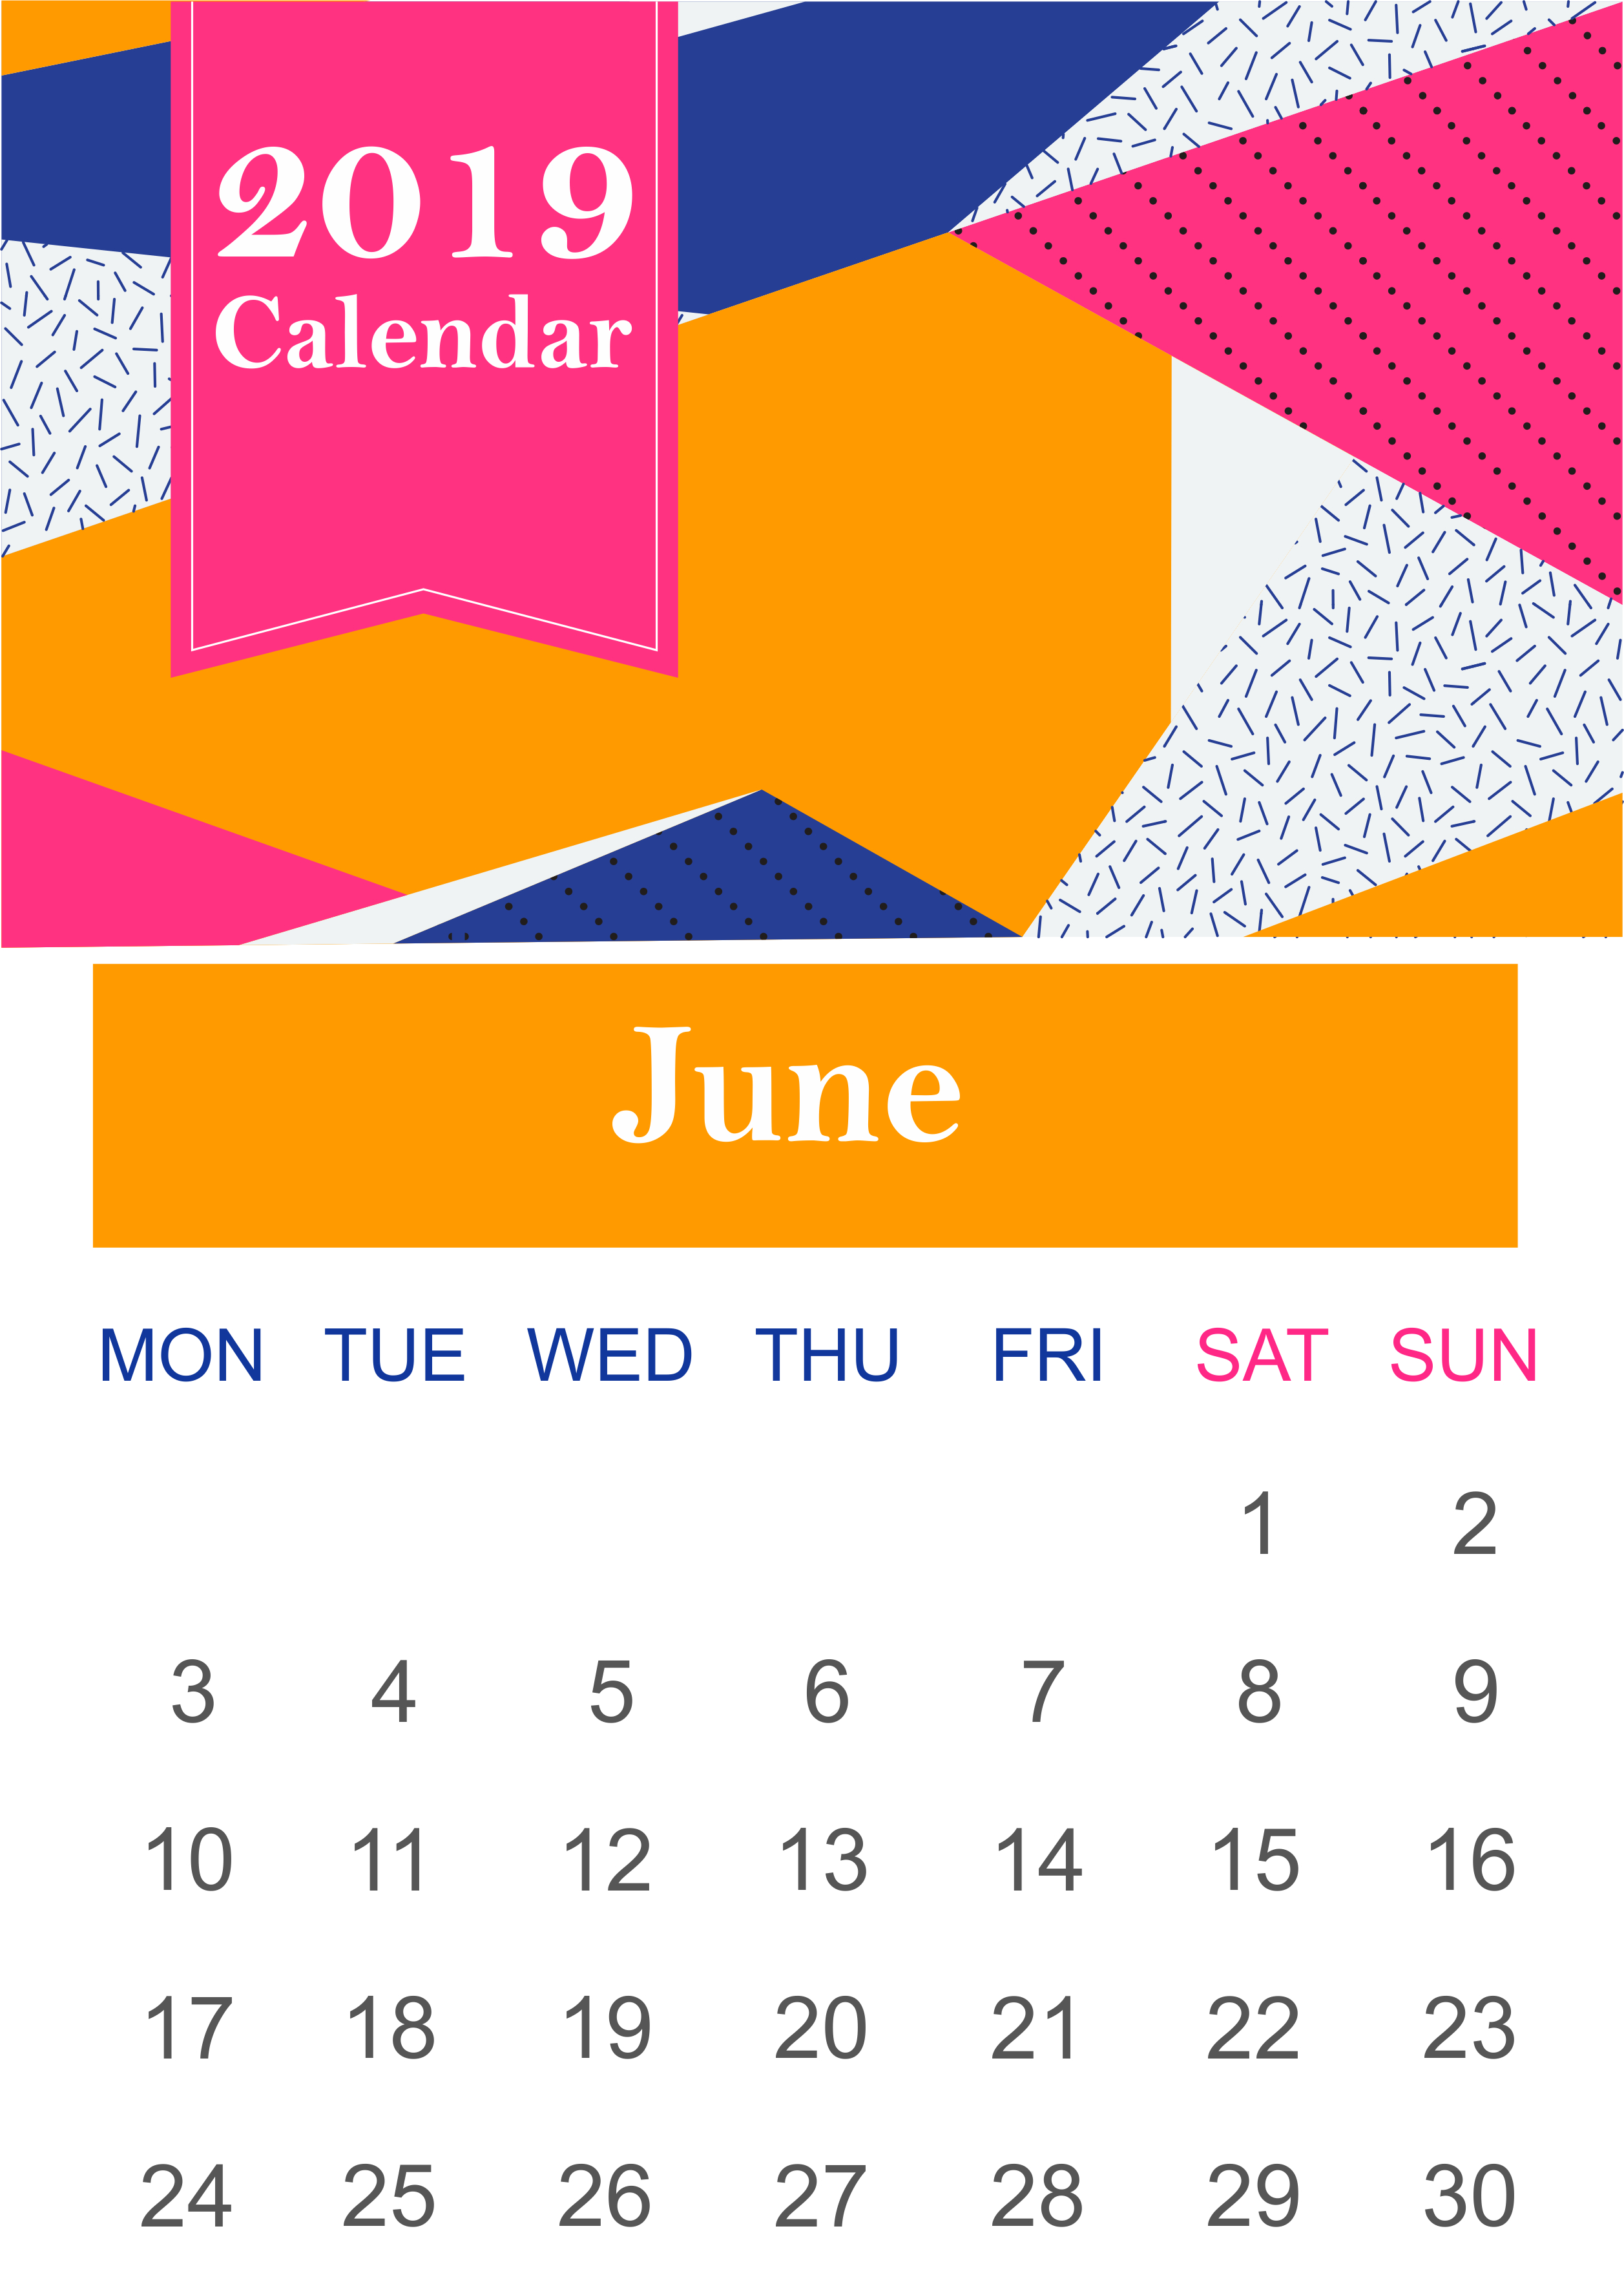 June 2019 Calendar Pdf – Free Printable Calendar Templates Blank June 8 2019 Calendar